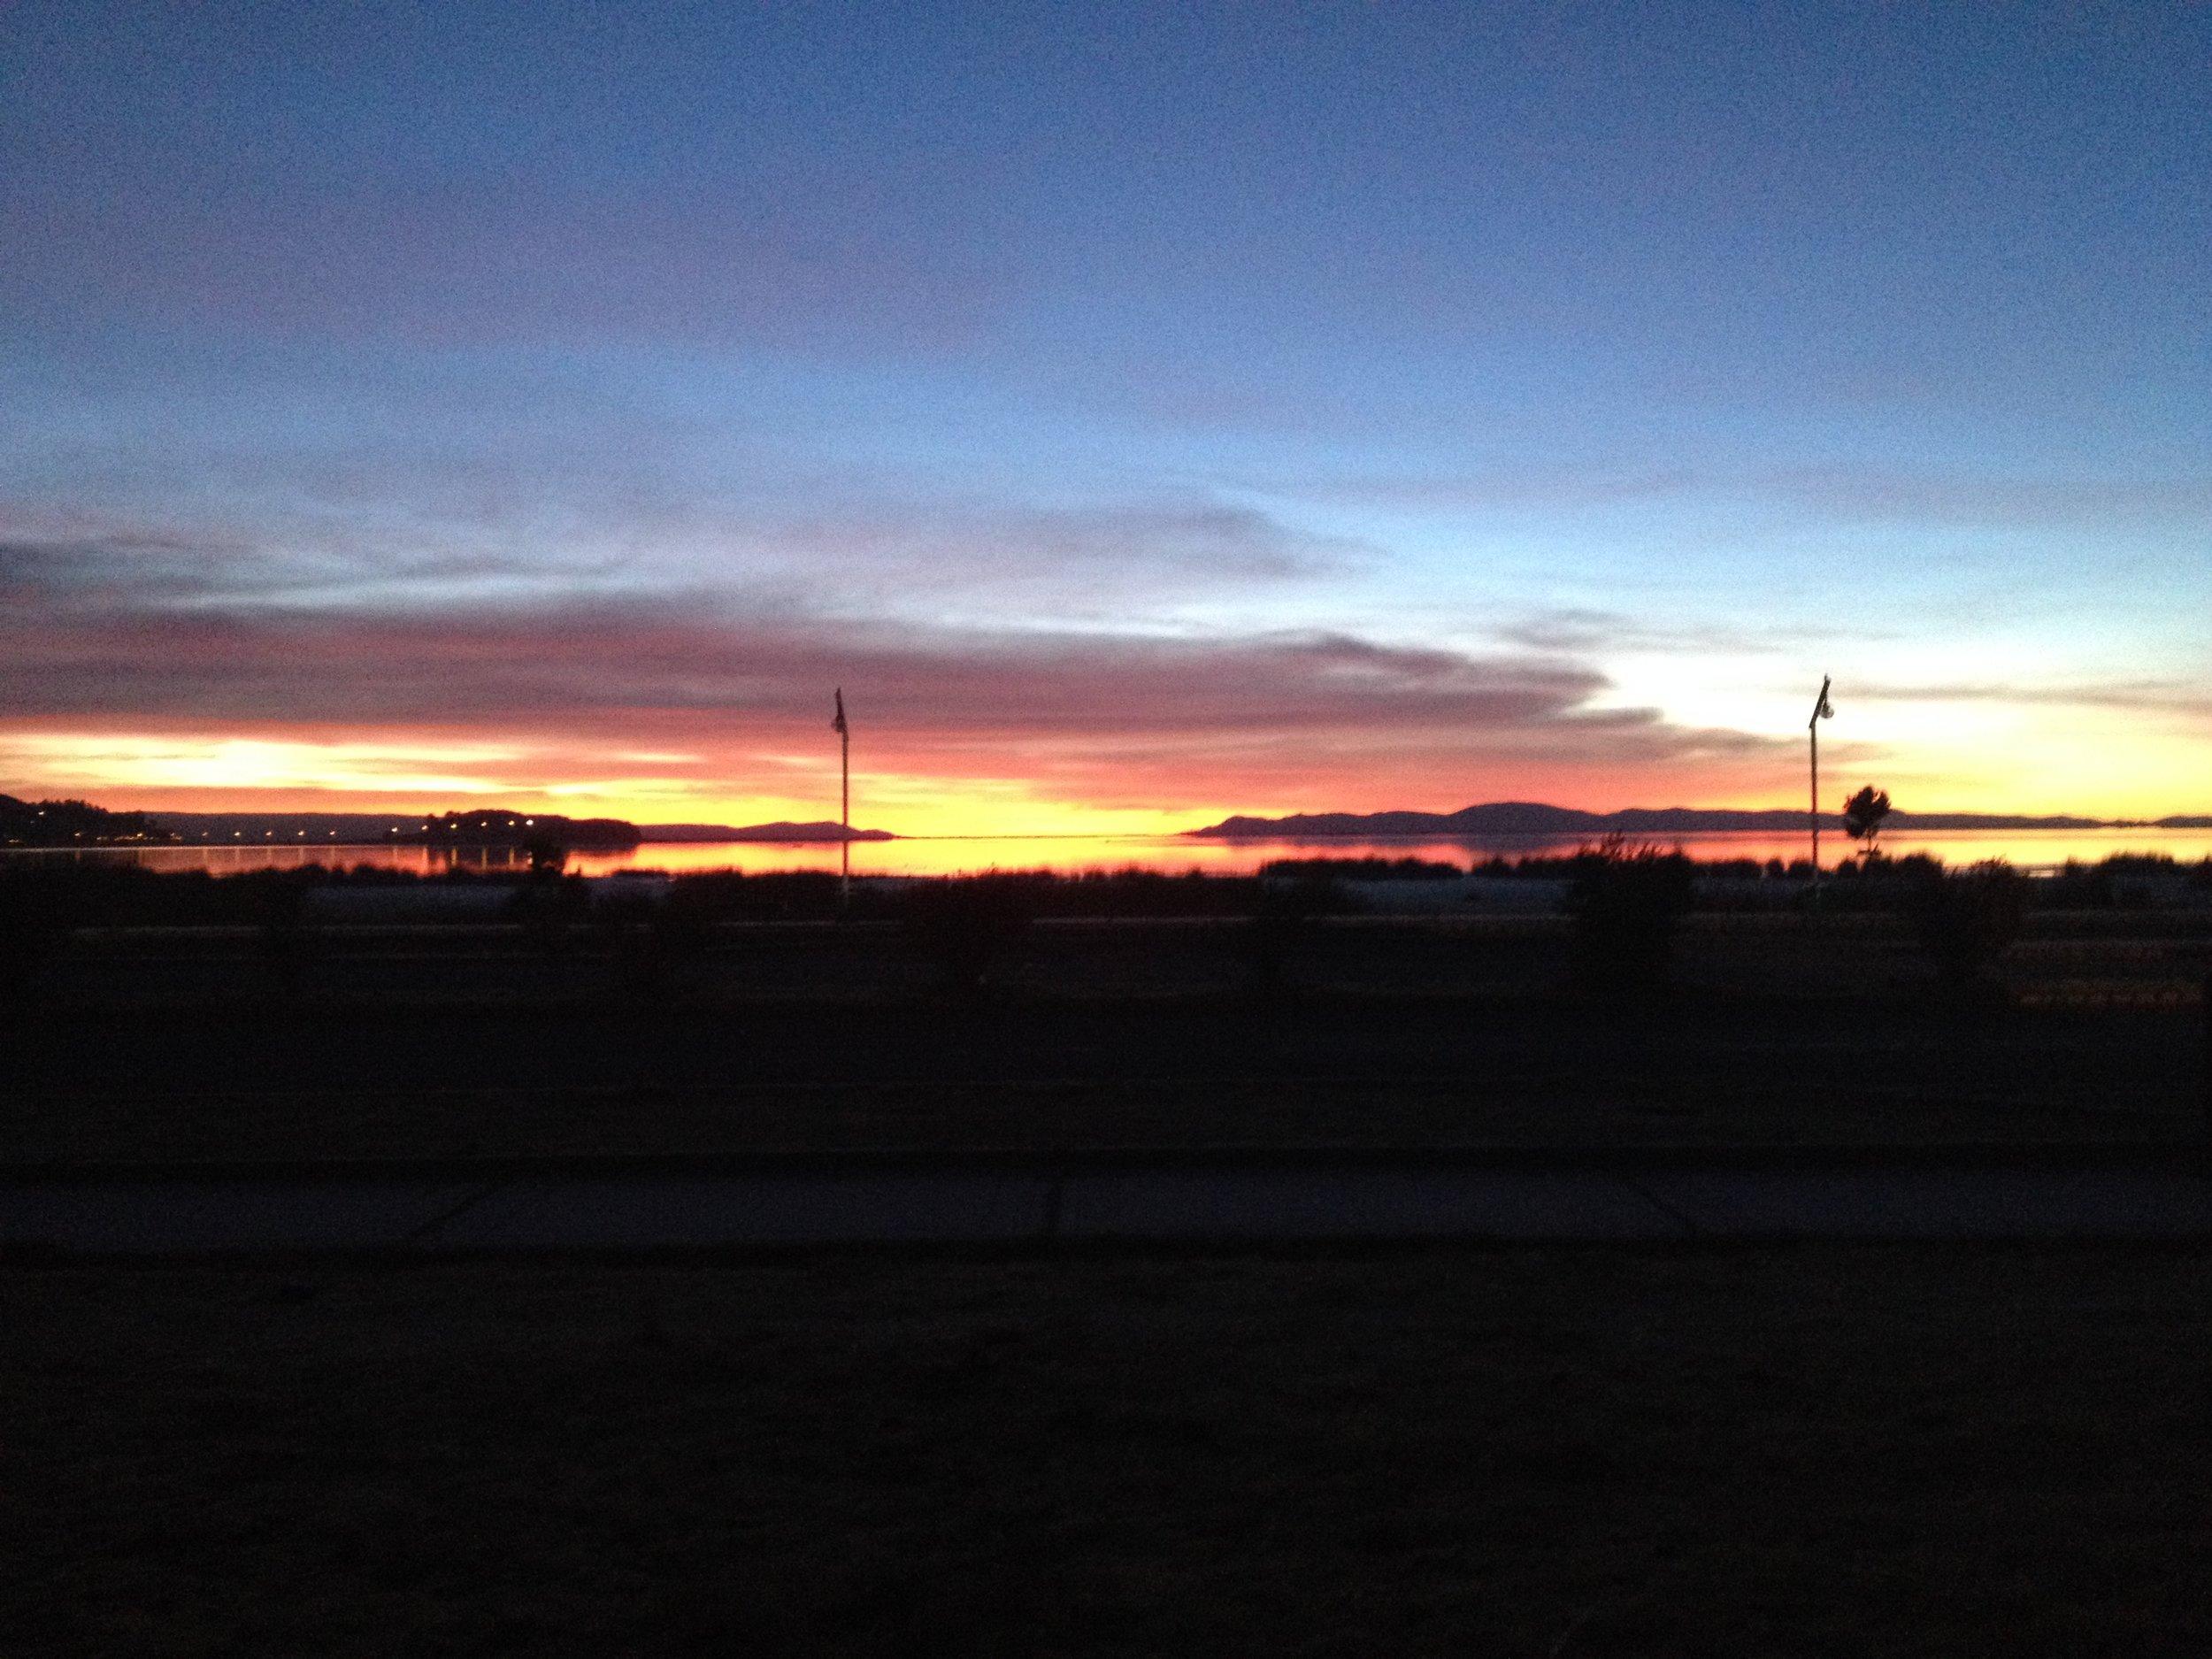 Lake Titicaca at Sunrise....was a magical sight